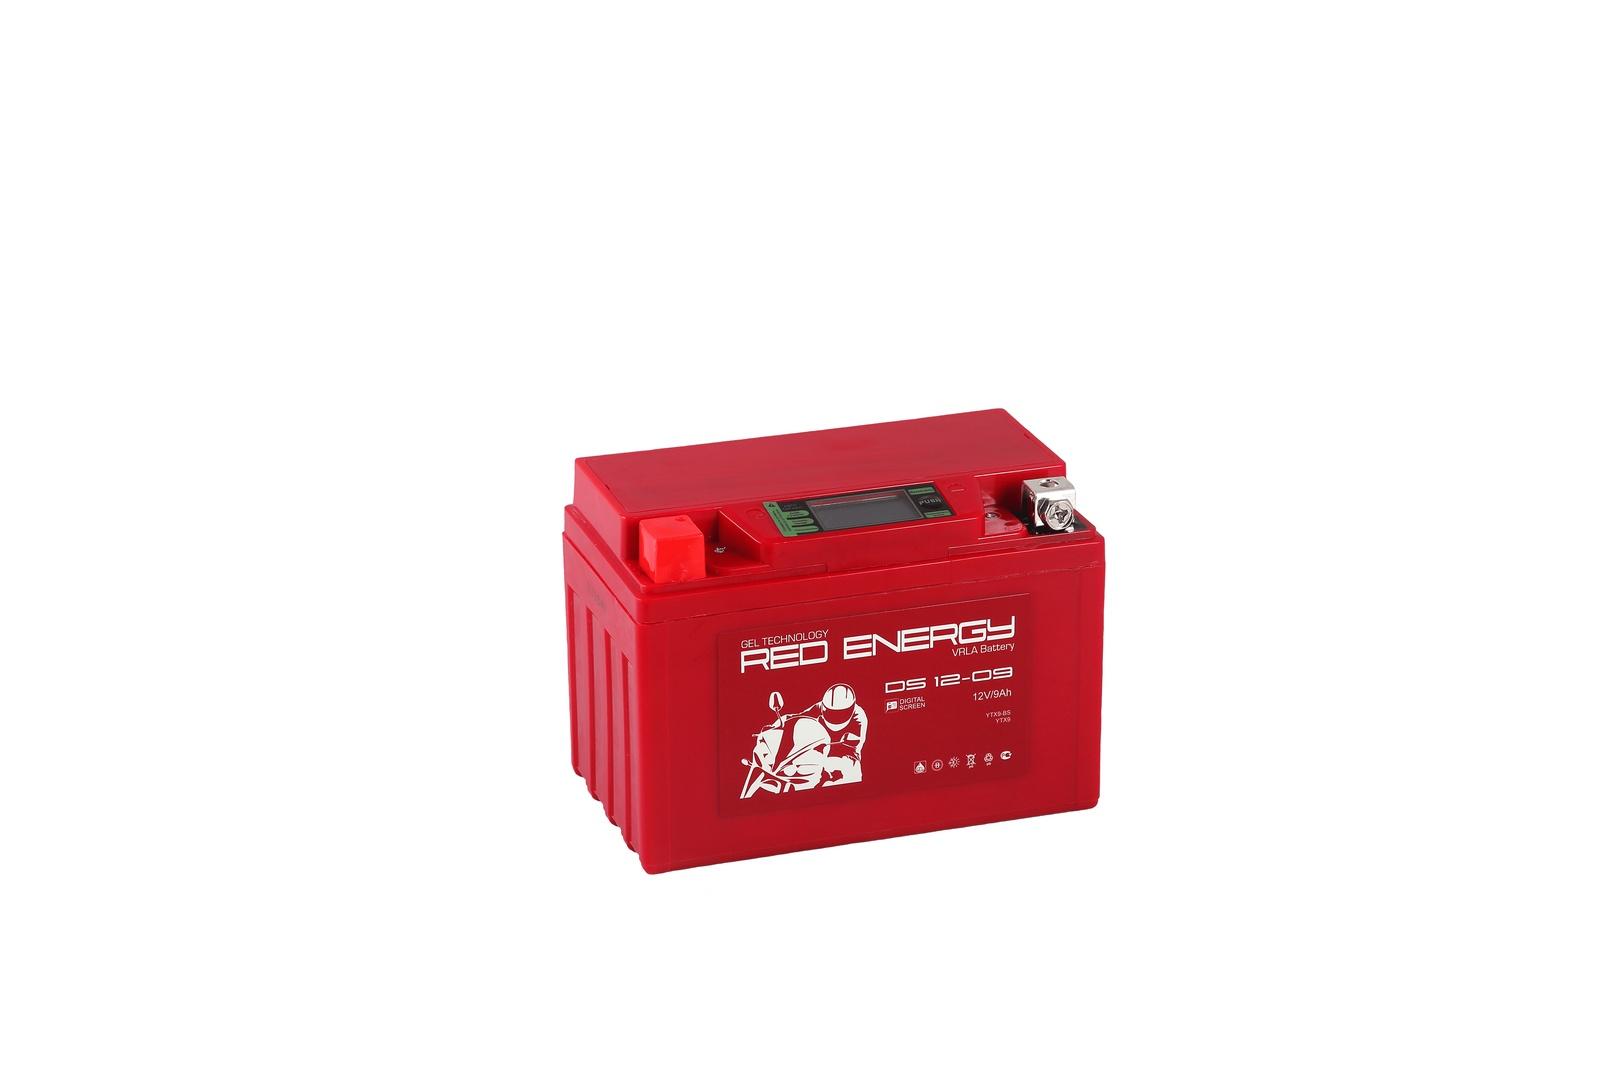 Аккумулятор для мототехники Red Energy DS 1209 все цены